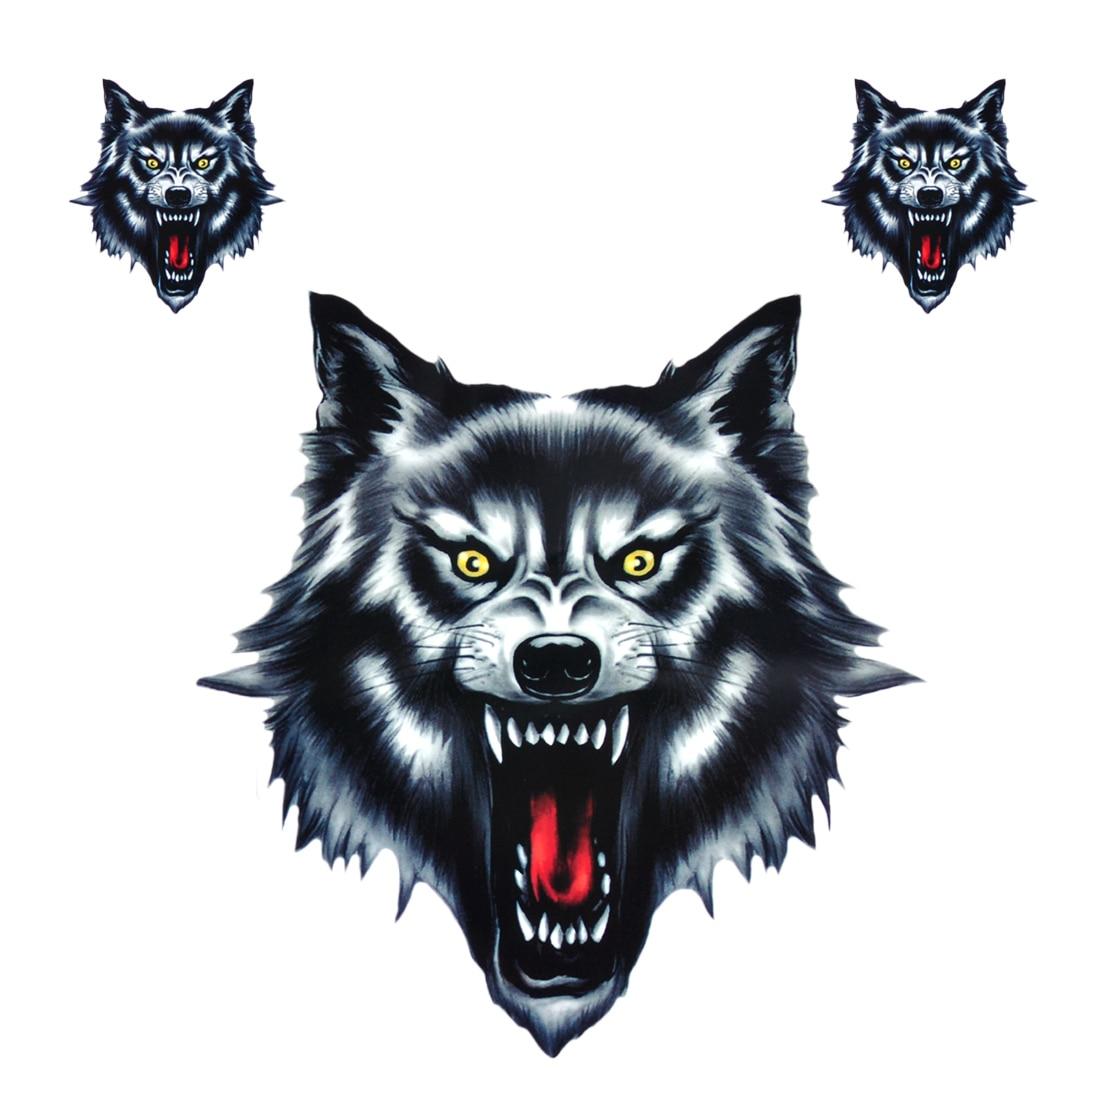 CITALL Wolf Head Decal Vinyl 18*25cm Funny Waterproof Sticker Fit For Motorcycle Motorbike Car Truck Helmet